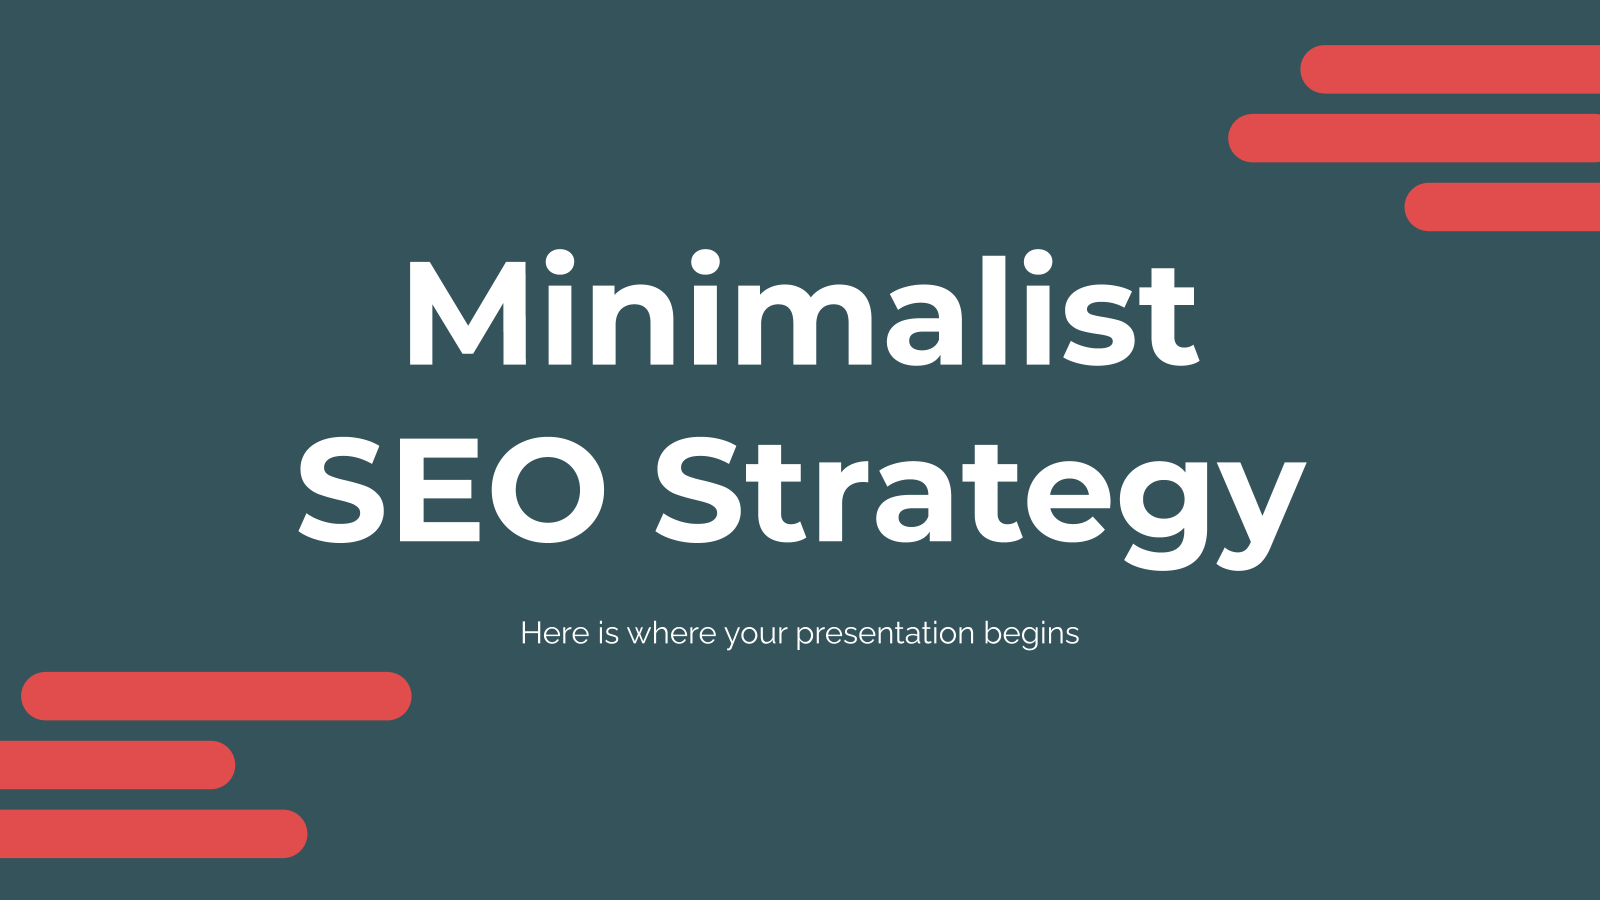 Minimalist SEO Strategy presentation template